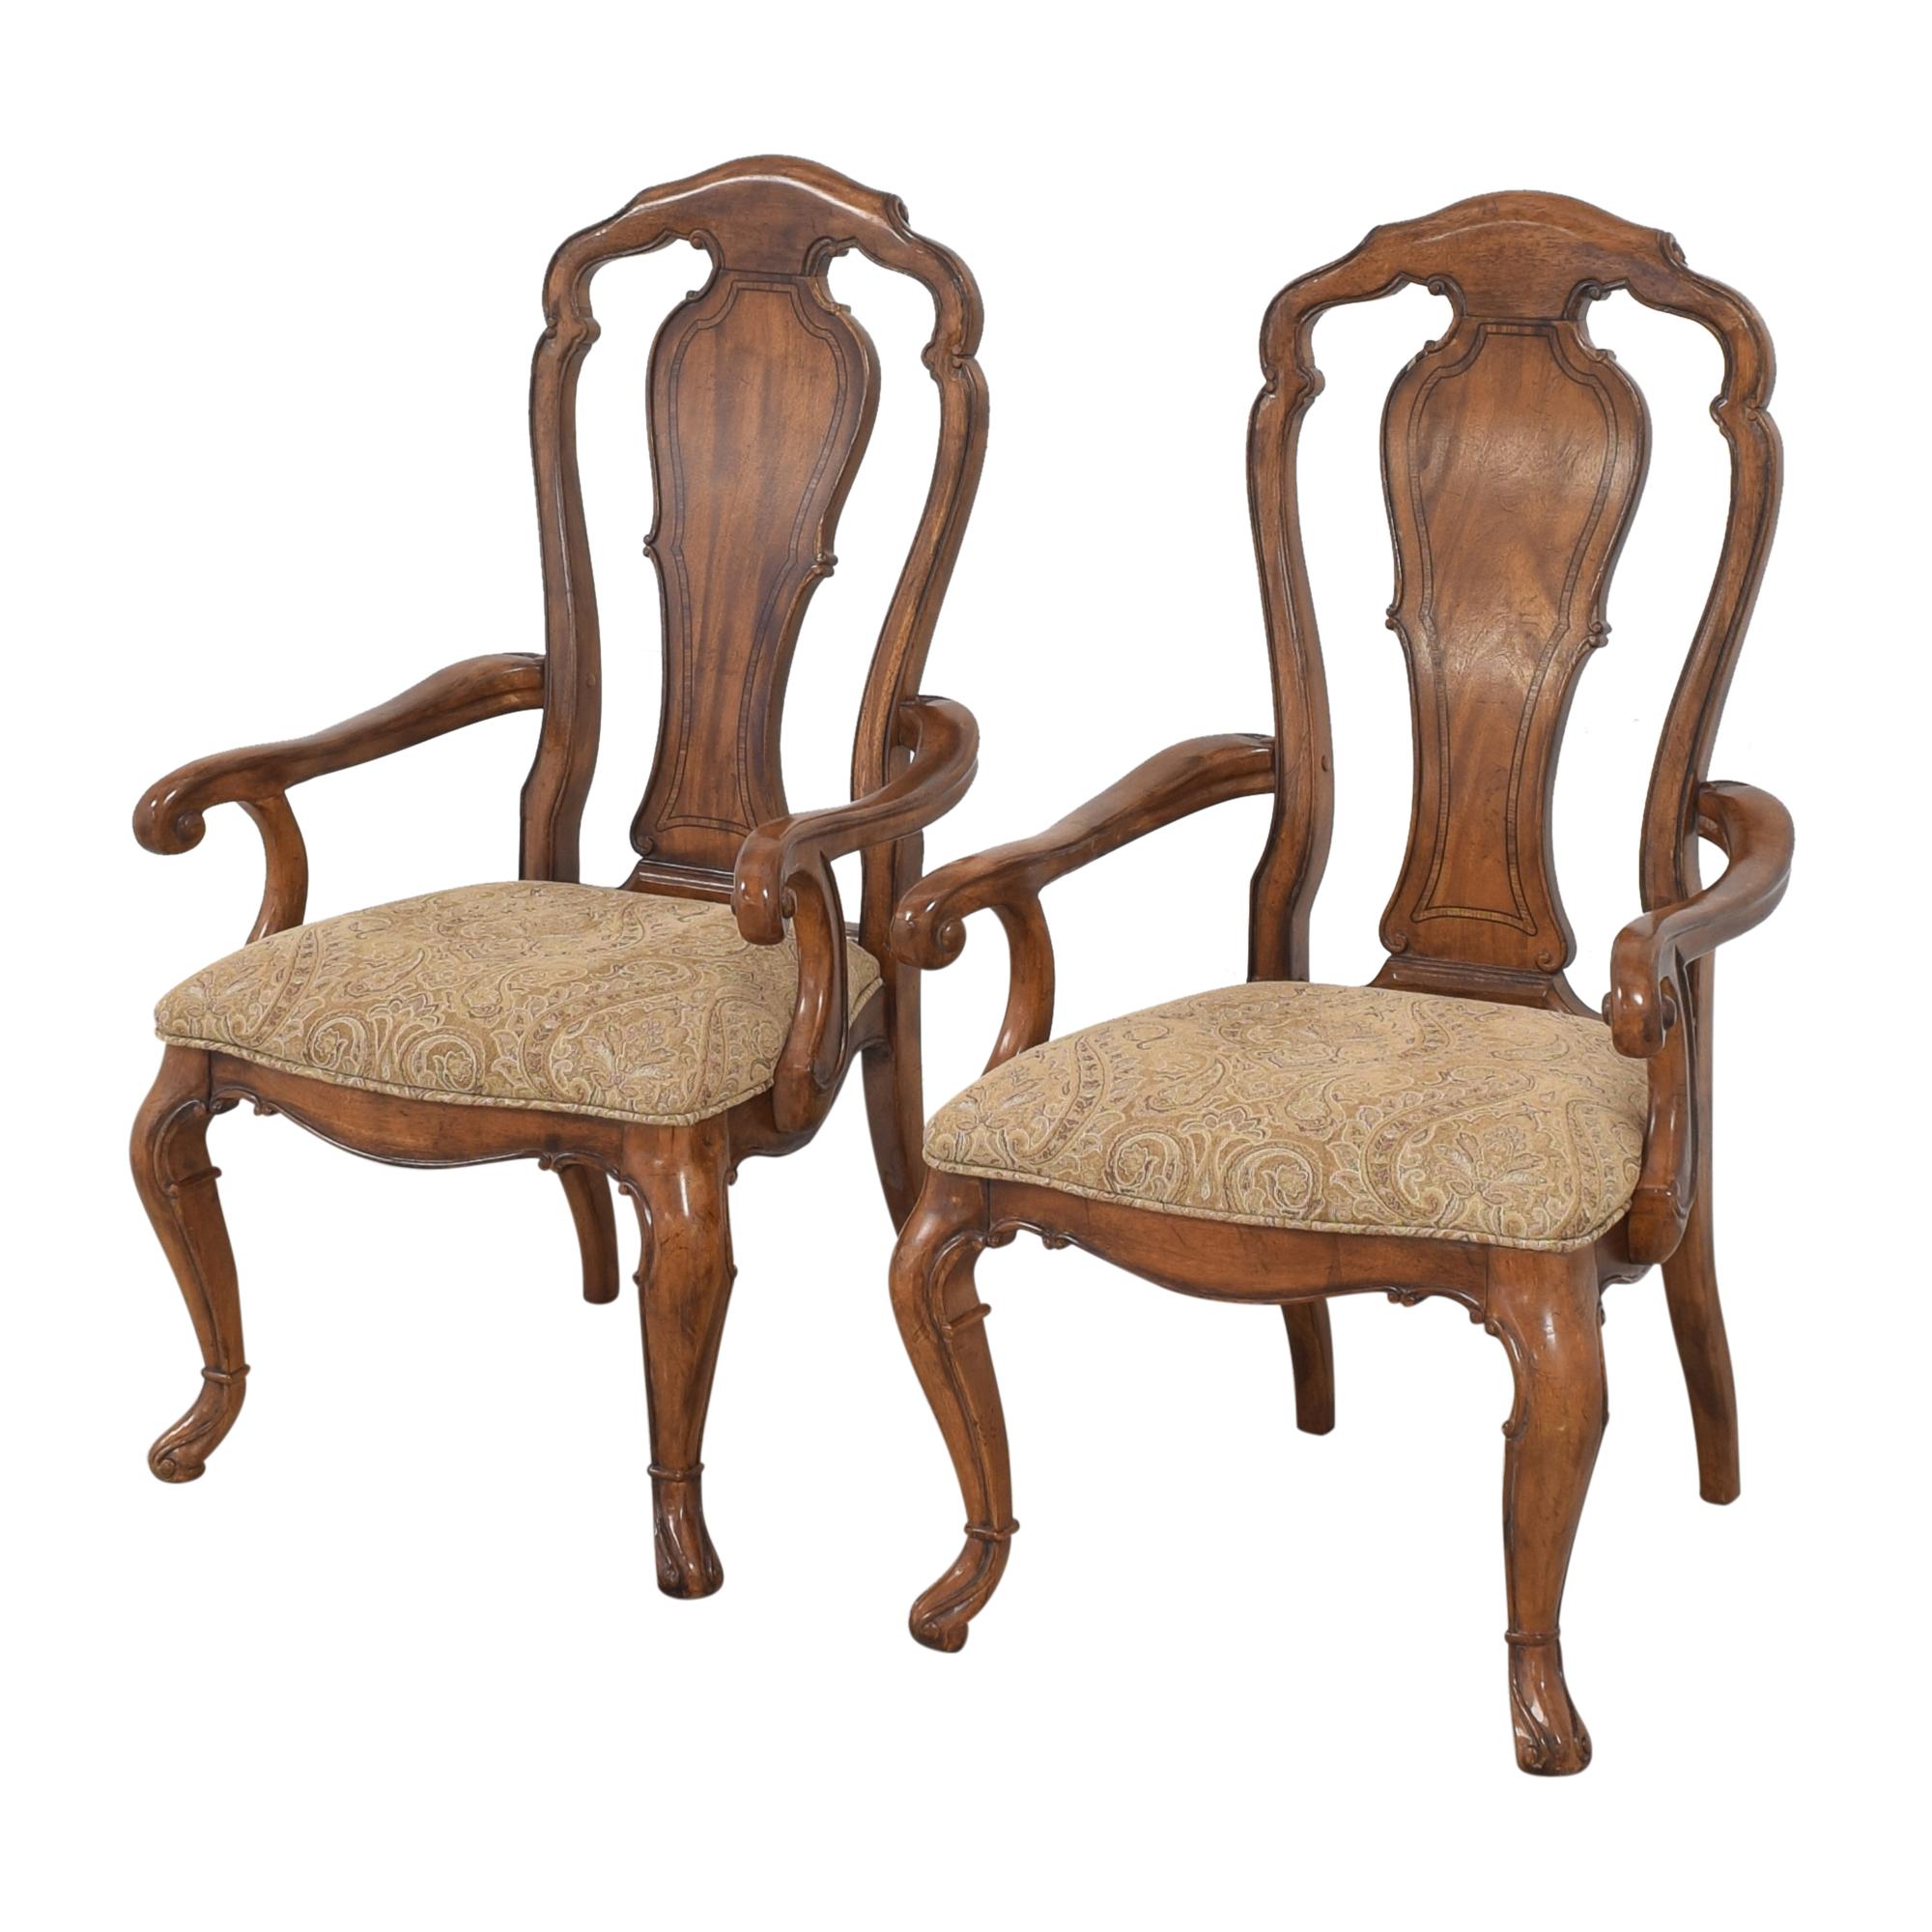 Thomasville Thomasville Ernest Hemingway Granada Dining Arm Chairs price